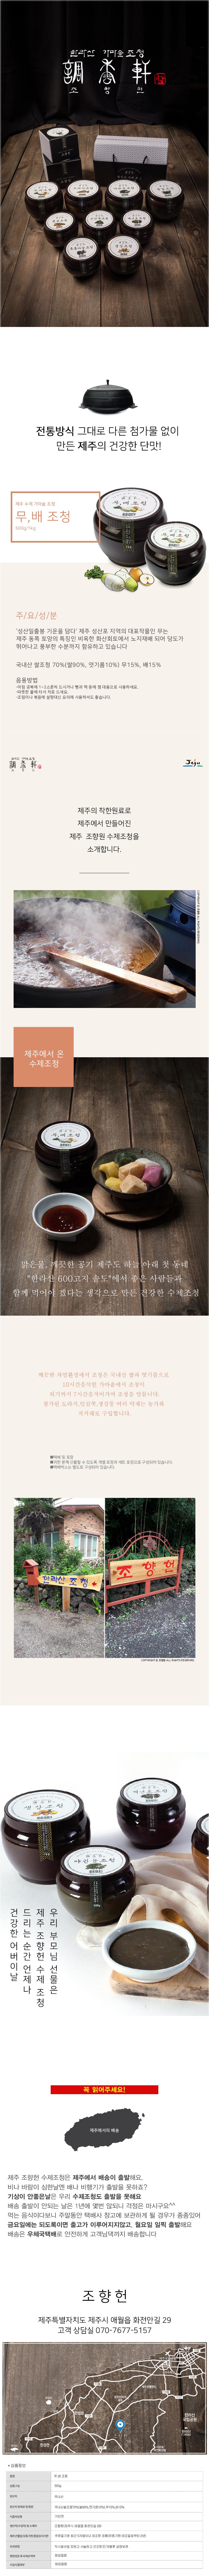 johyahuen_page_moobae_500g.jpg